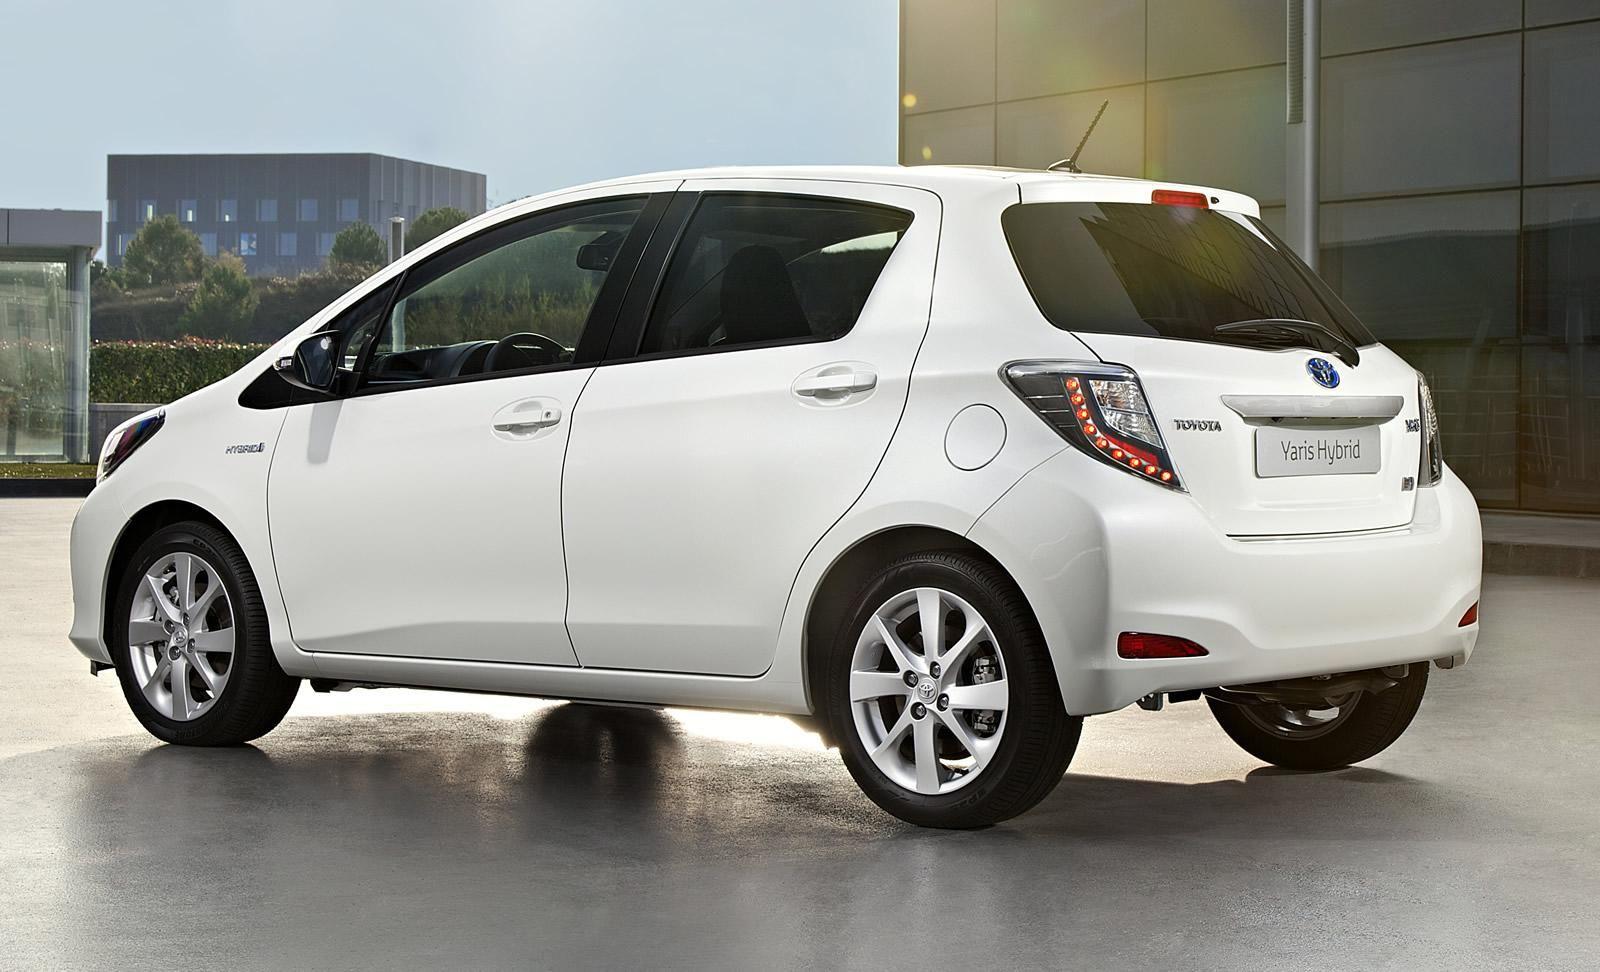 Toyota Yaris Hybrid 2012 Toyota Carros